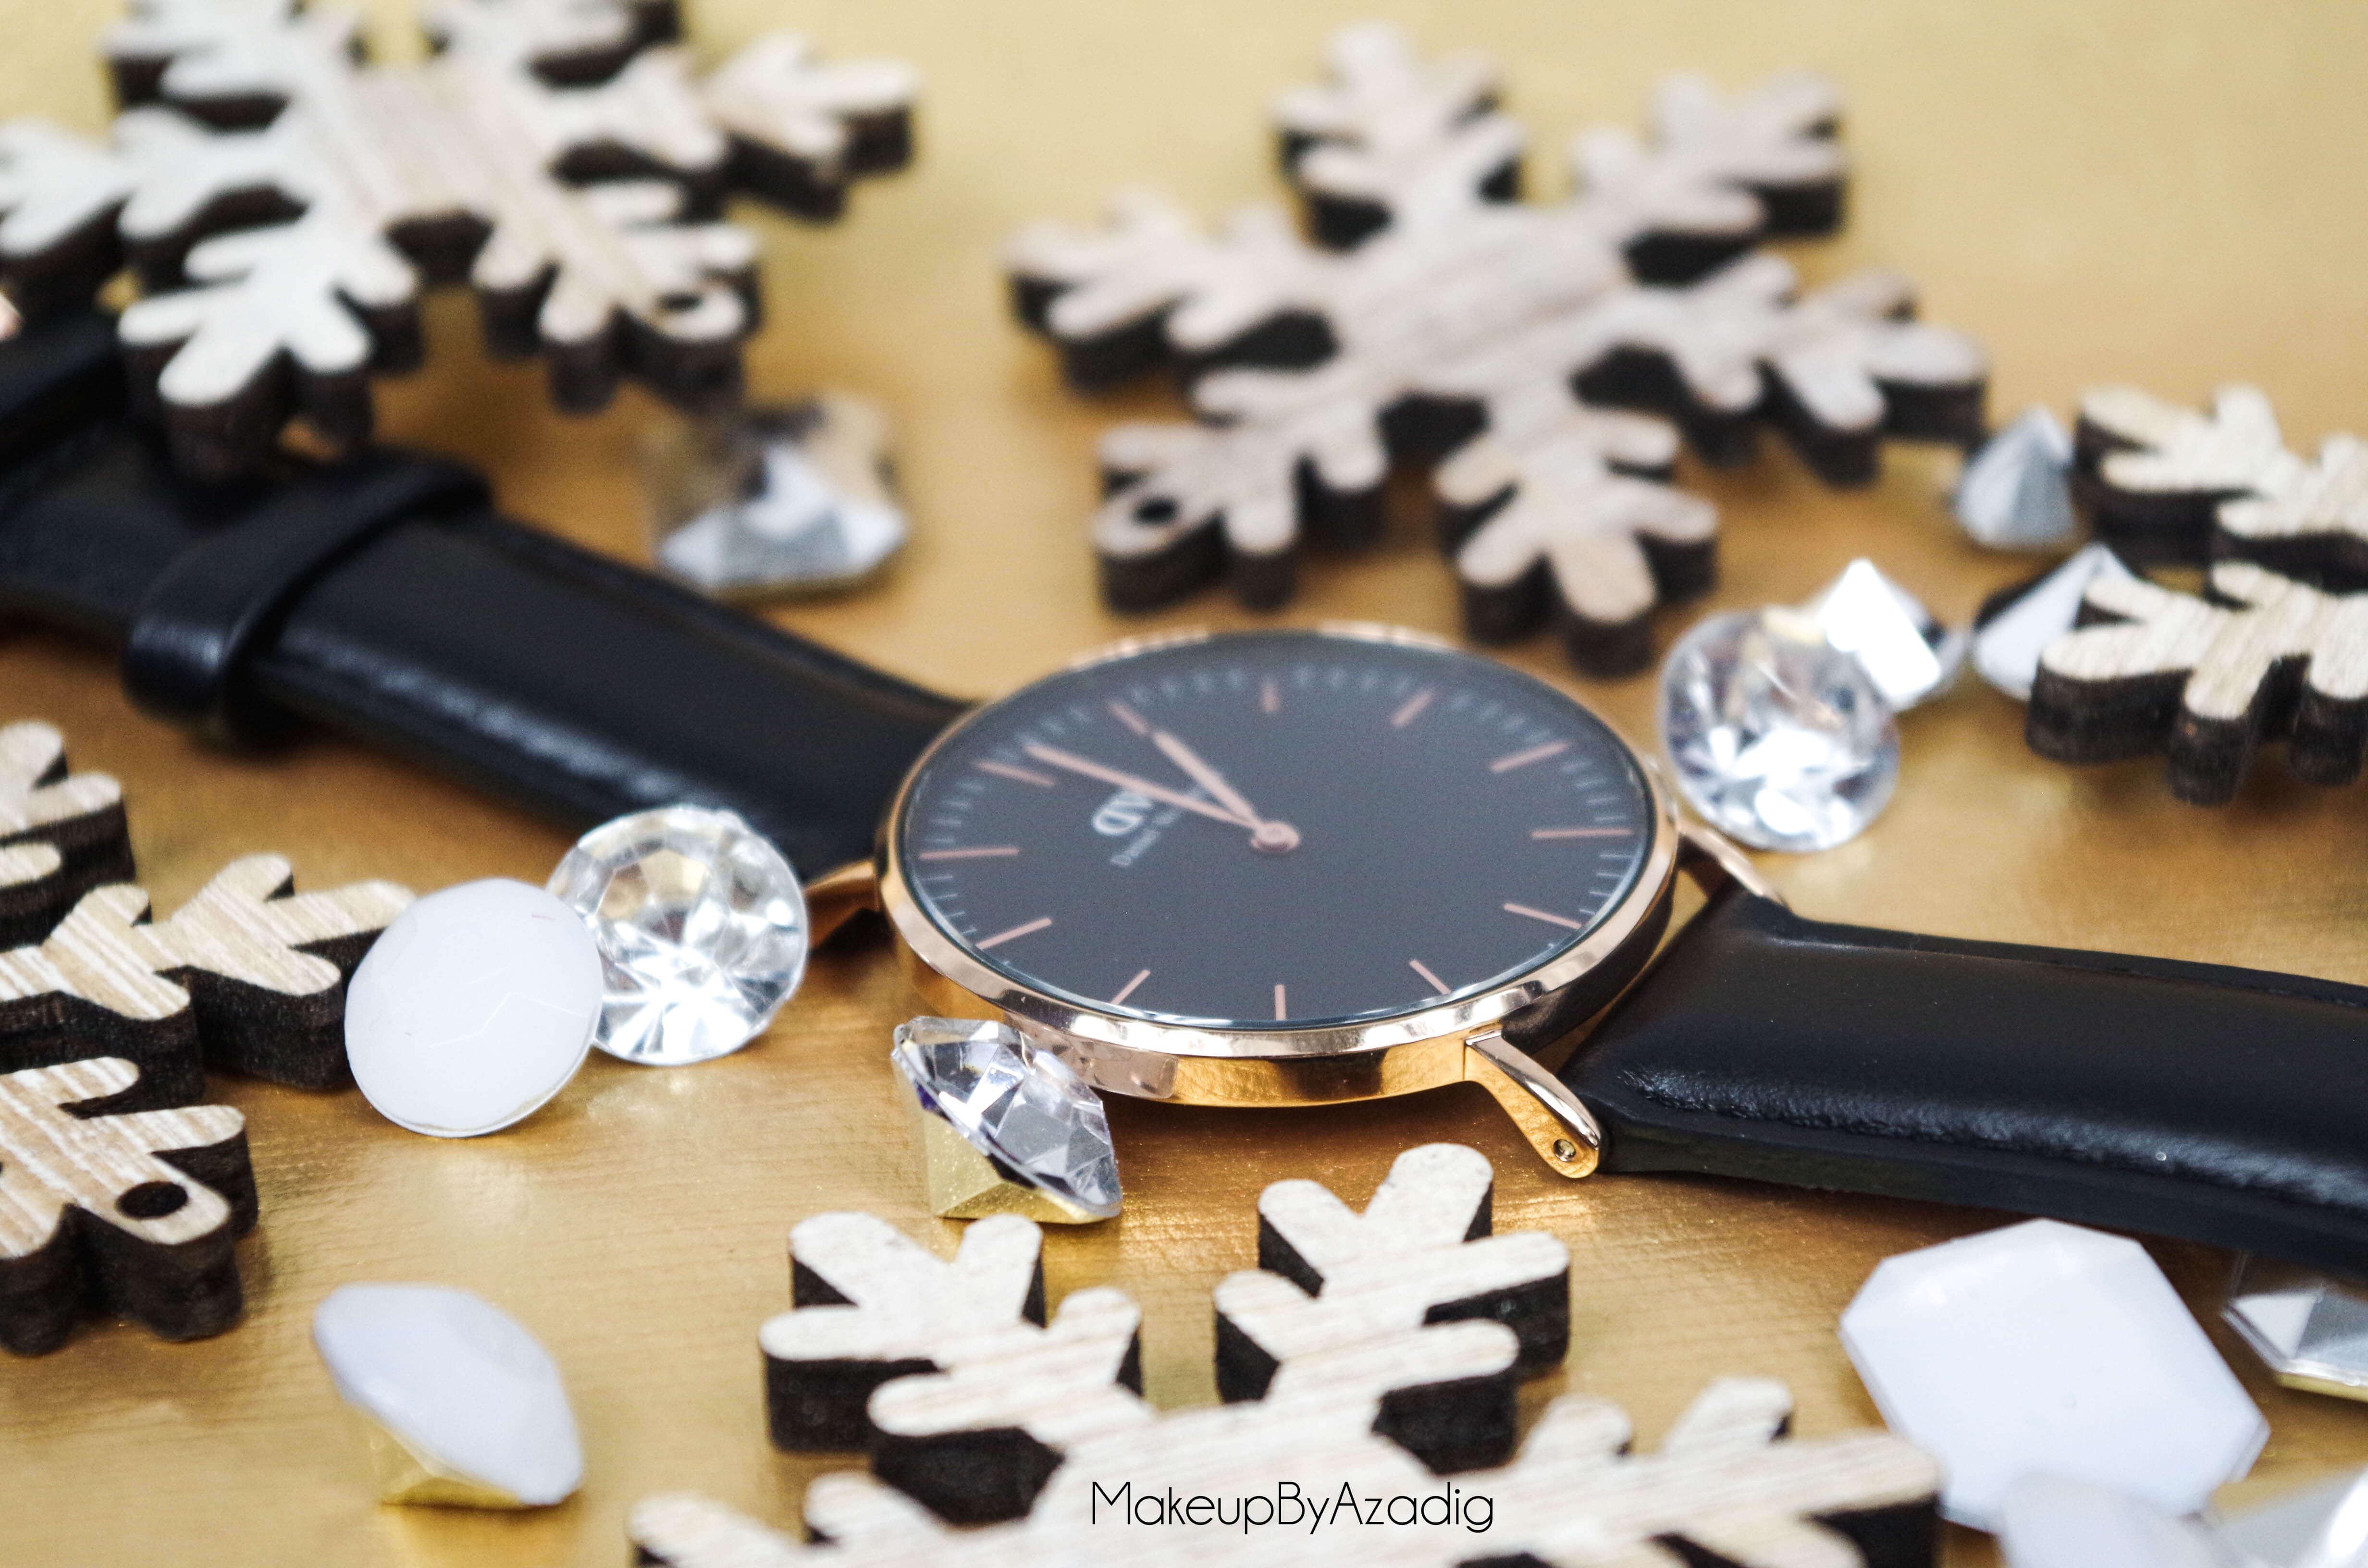 makeupbyazadig-daniel-wellington-montre-classic-black-sheffield-code-promo-troyes-paris-love